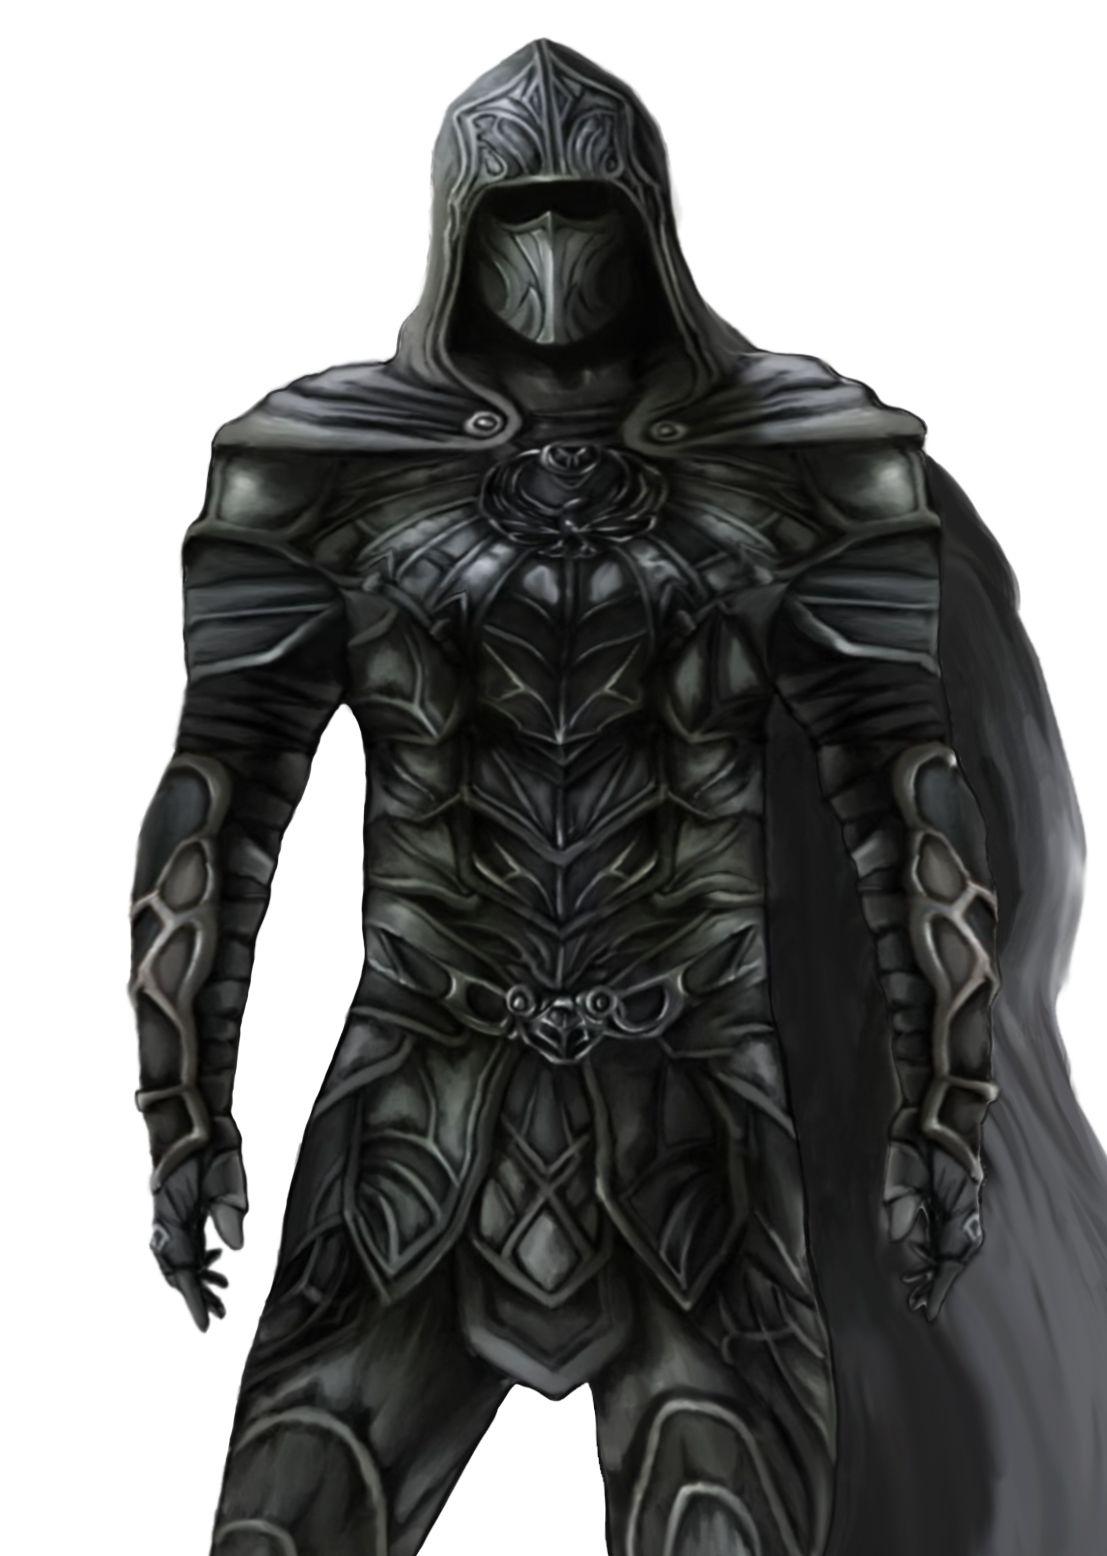 Black leather gloves skyrim - Skyrim Nightingale Painting Nightingale Armor By Williamfdrake Digital Art Drawings Paintings